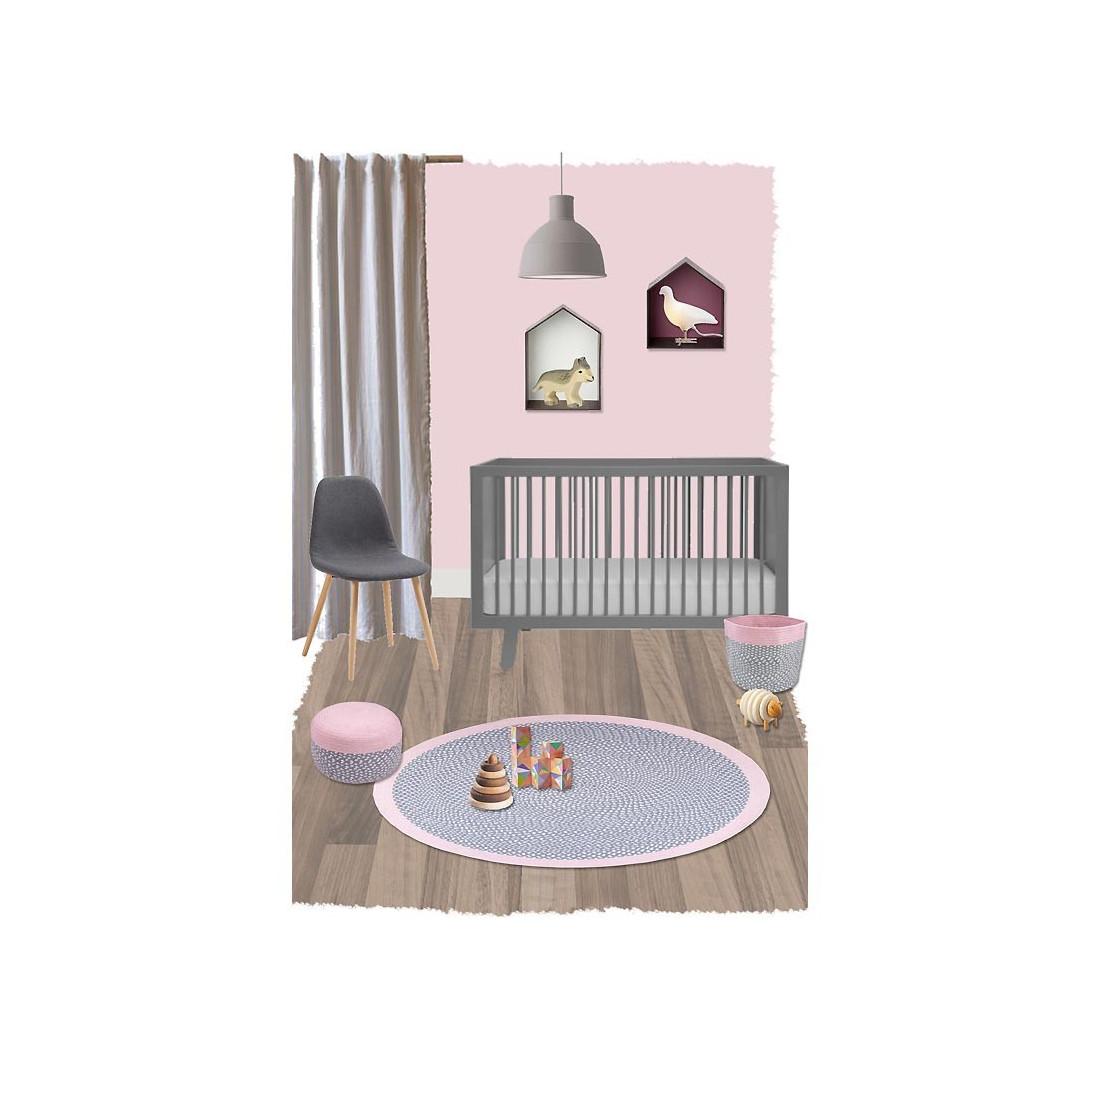 tapis enfant coton rond brenda rose nattiot ma chambramoi. Black Bedroom Furniture Sets. Home Design Ideas